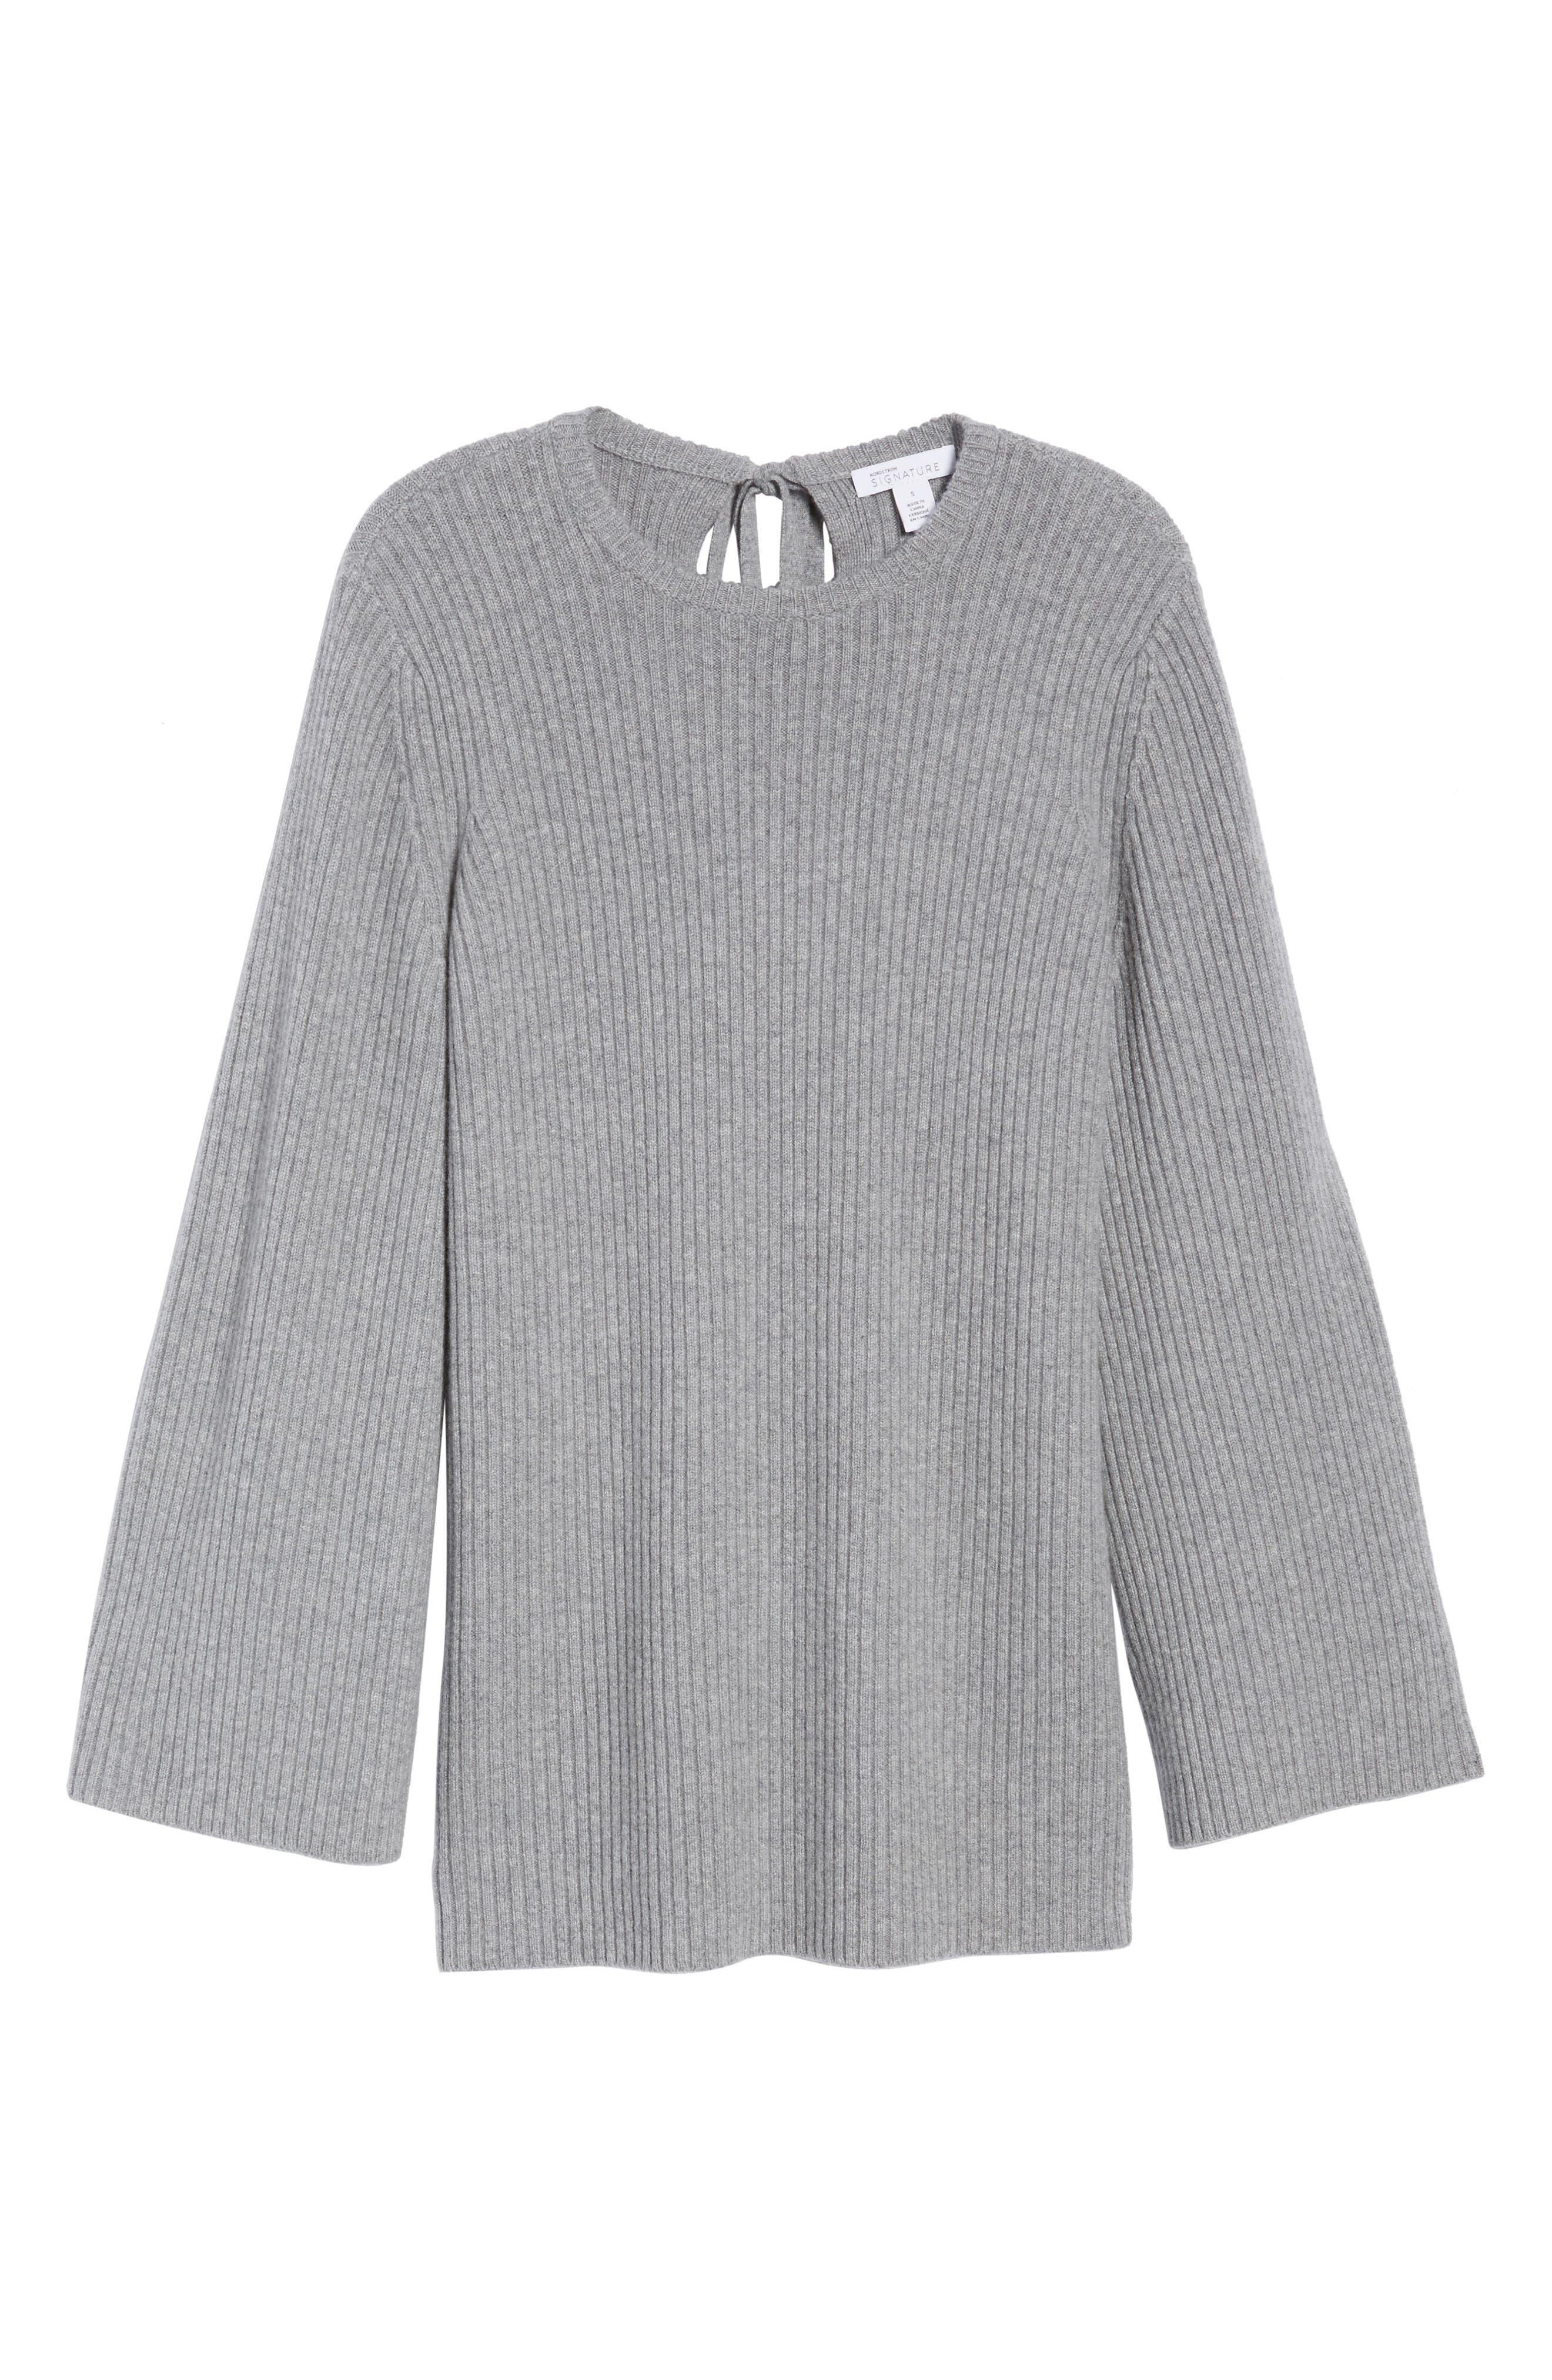 Tie Back Cashmere Blend Sweater,                             Alternate thumbnail 6, color,                             Grey Filigree Heather